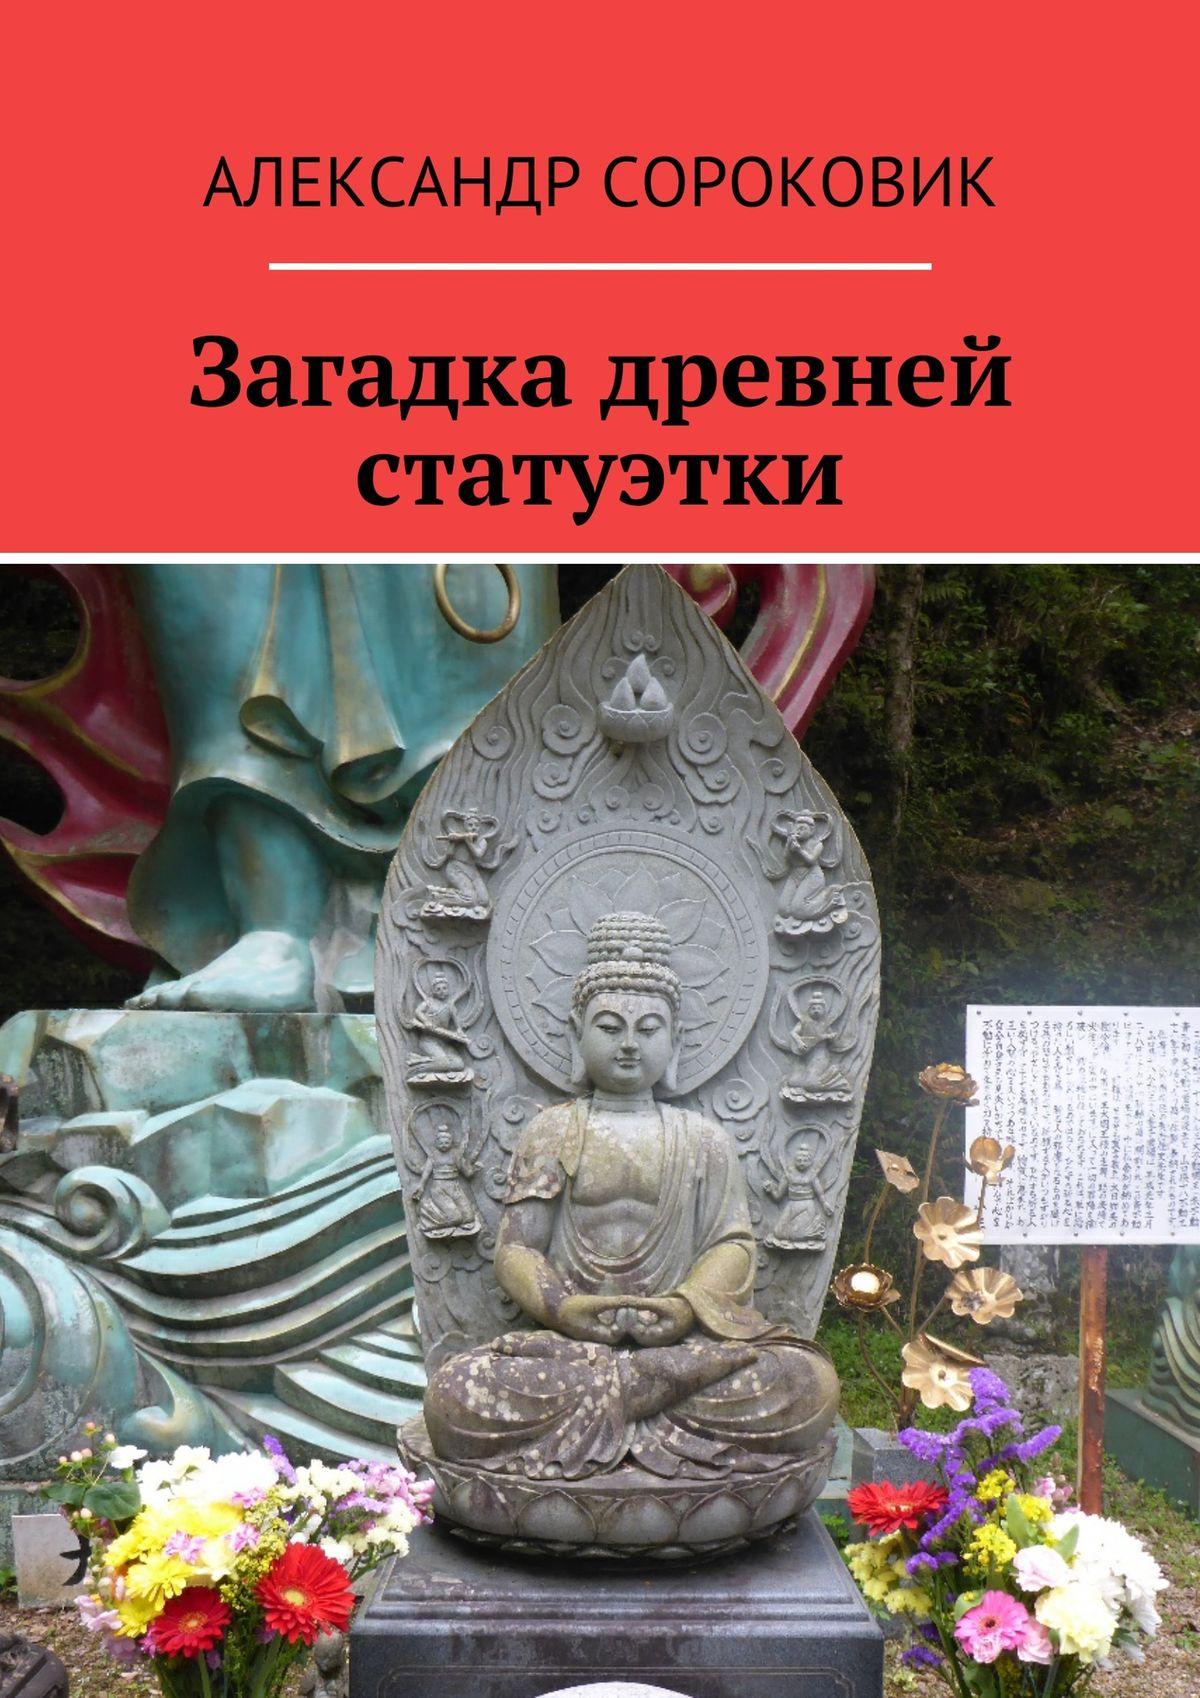 Александр Сороковик Загадка древней статуэтки статуэтки